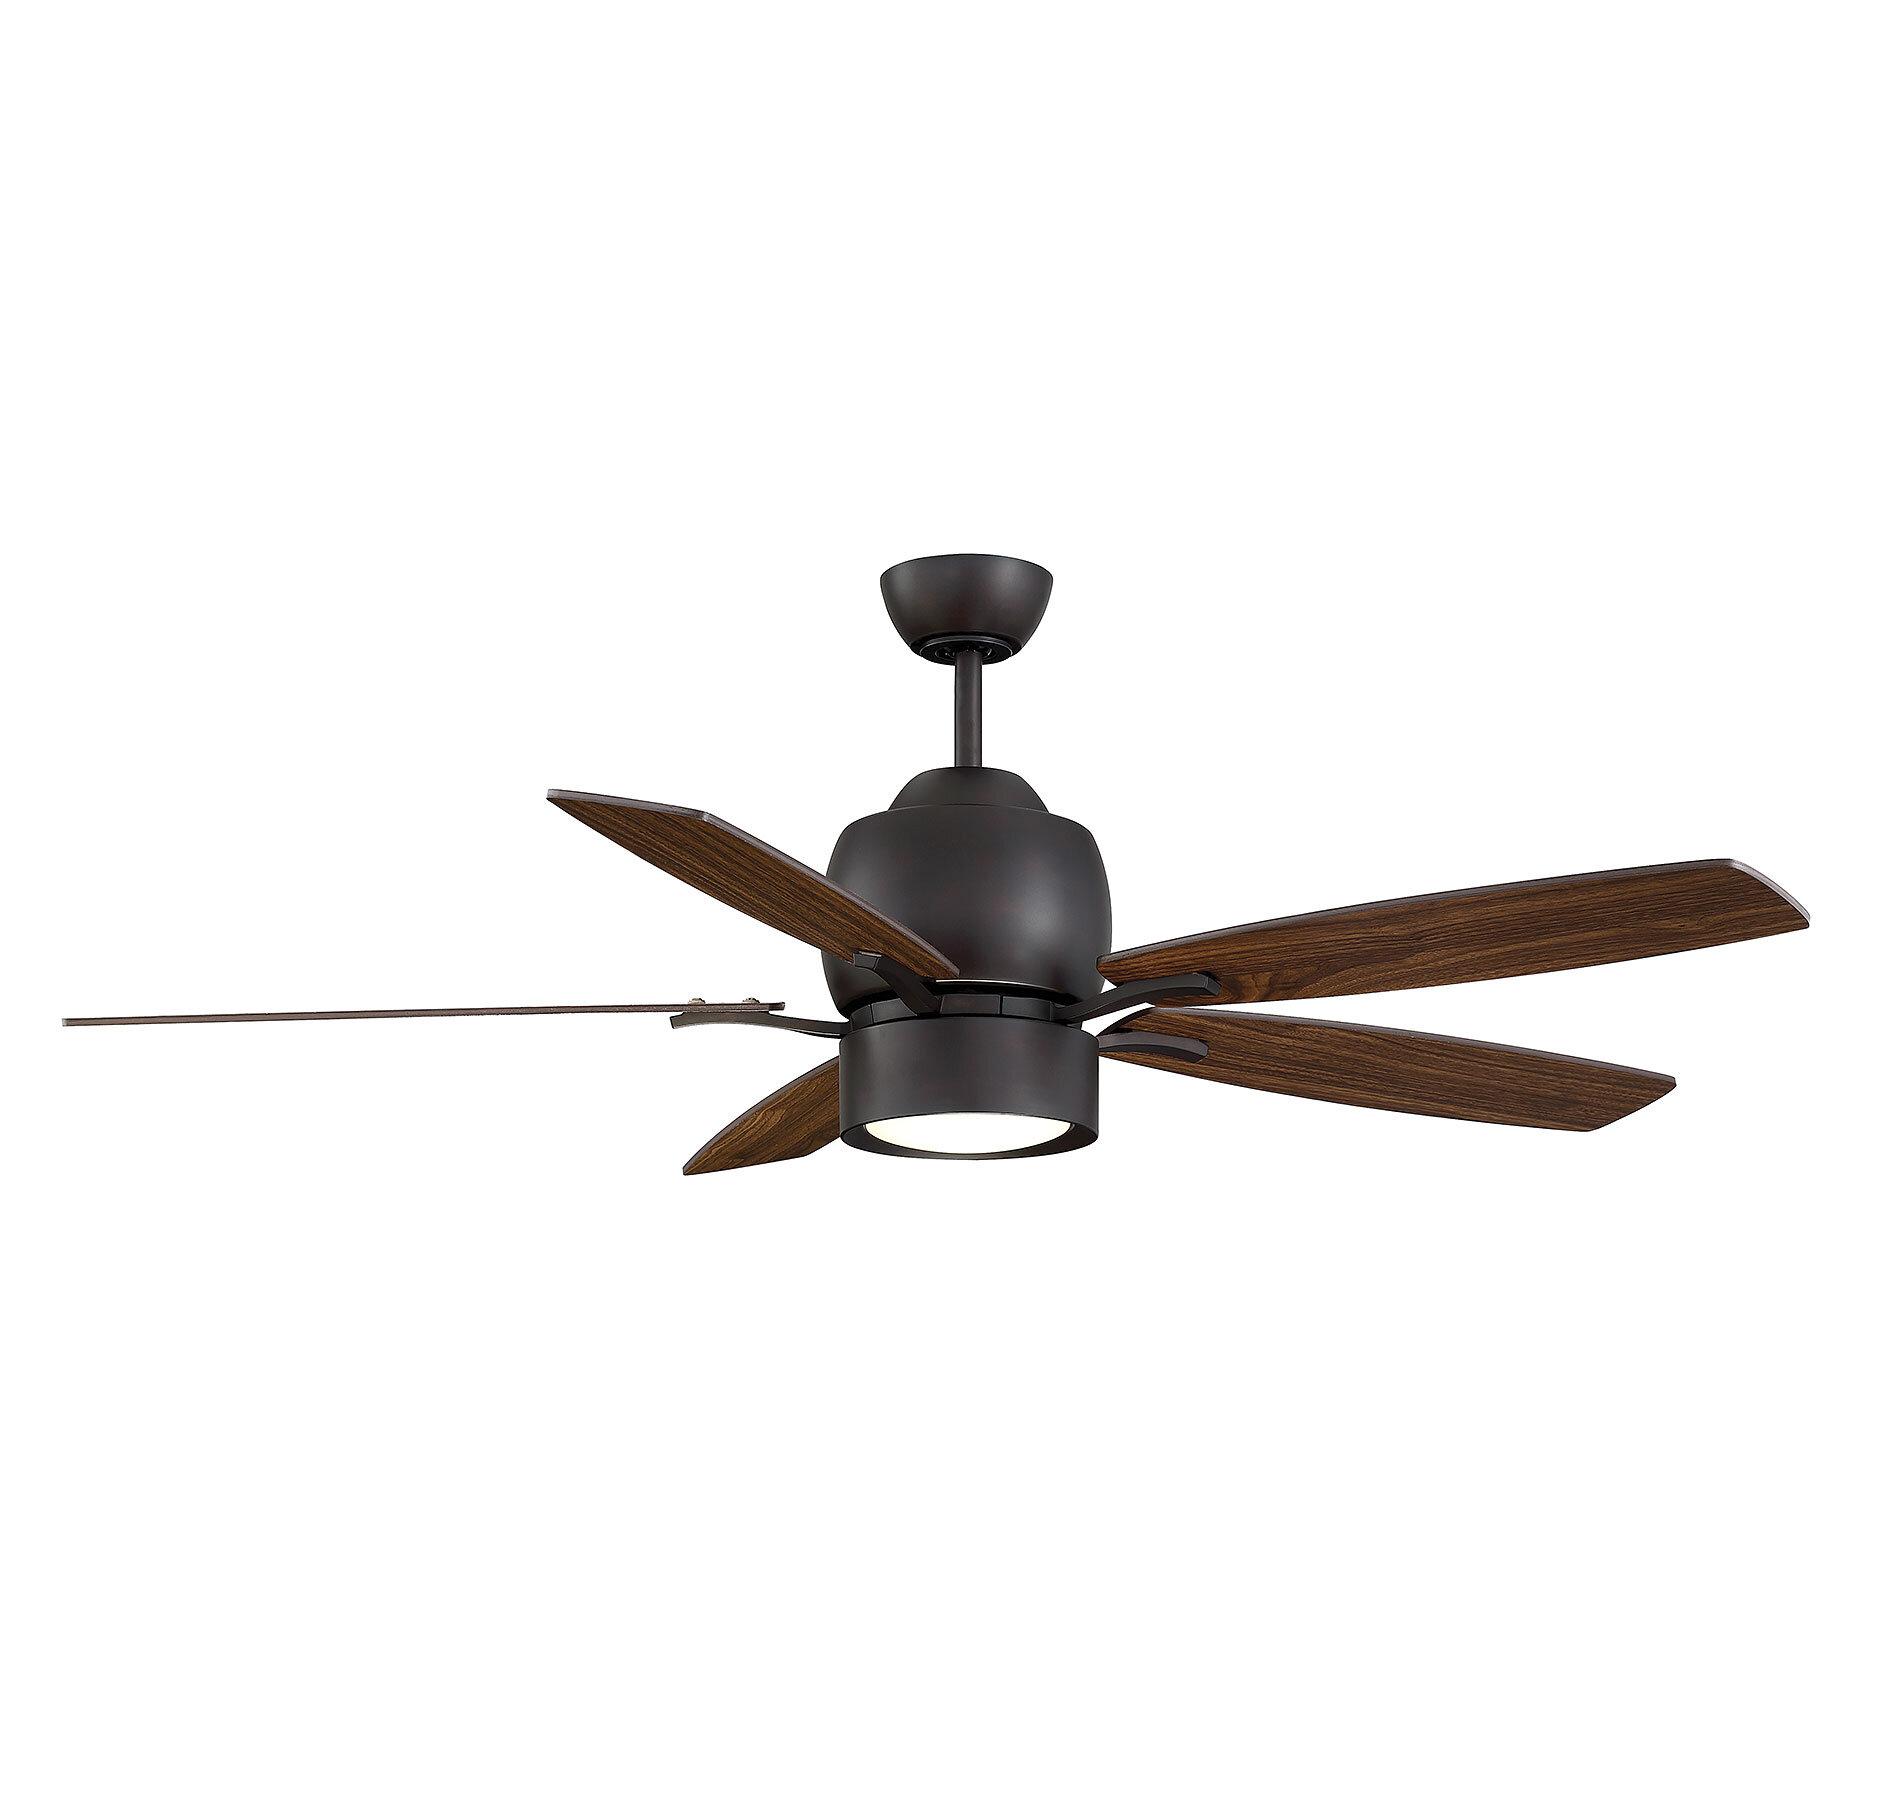 Brayden Studio Dorset 5 Blade Ceiling Fan with Remote